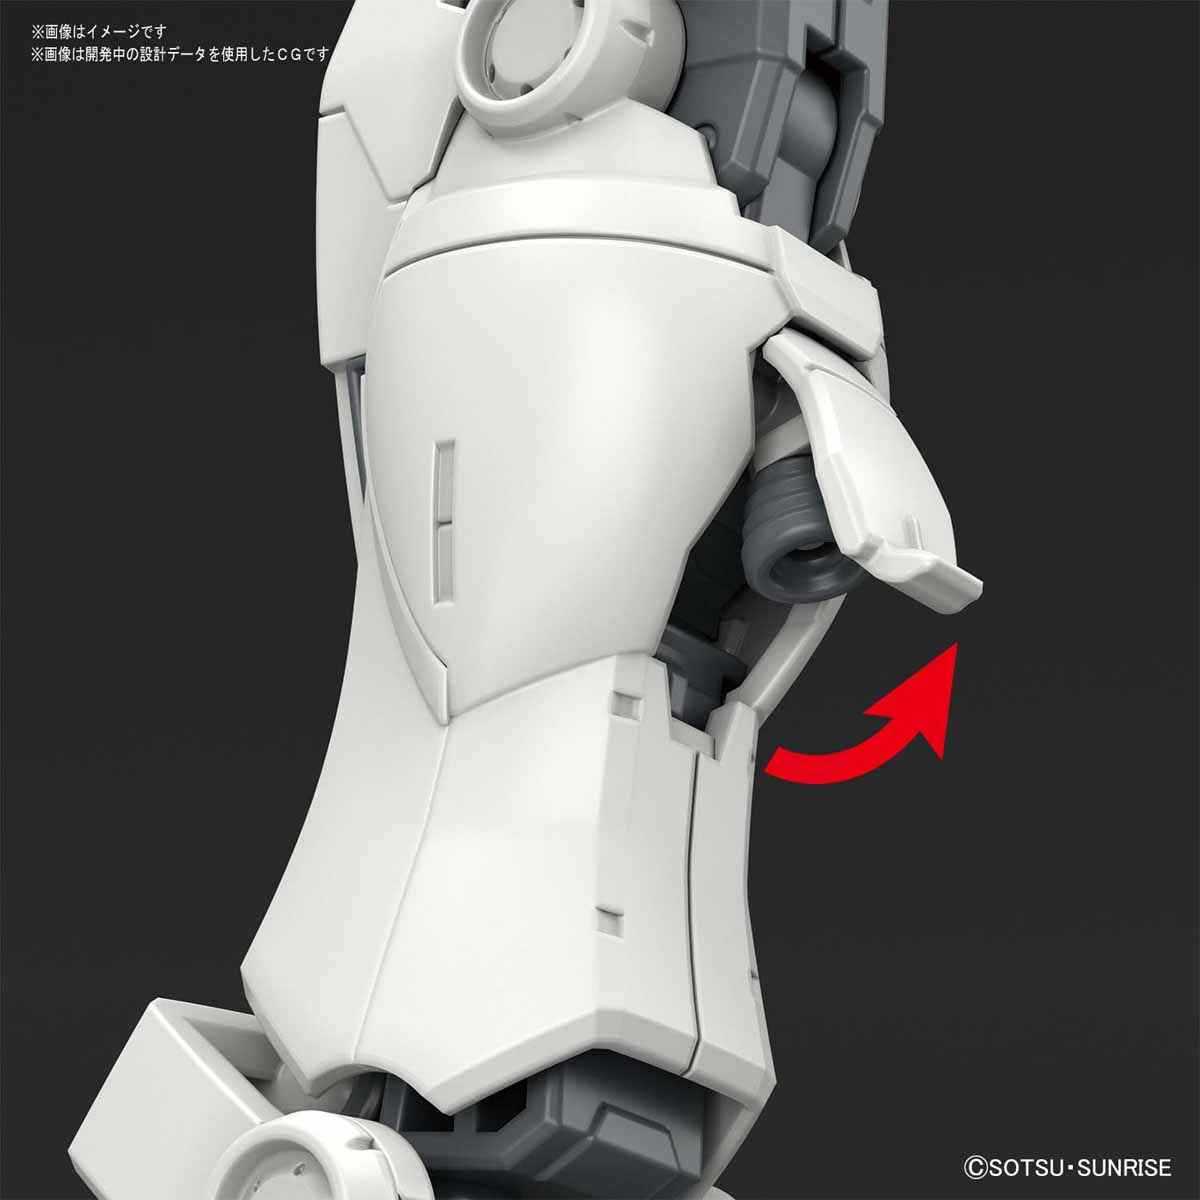 HG 1/144『RX-78-02 ガンダム(GUNDAM THE ORIGIN版)』プラモデル-009